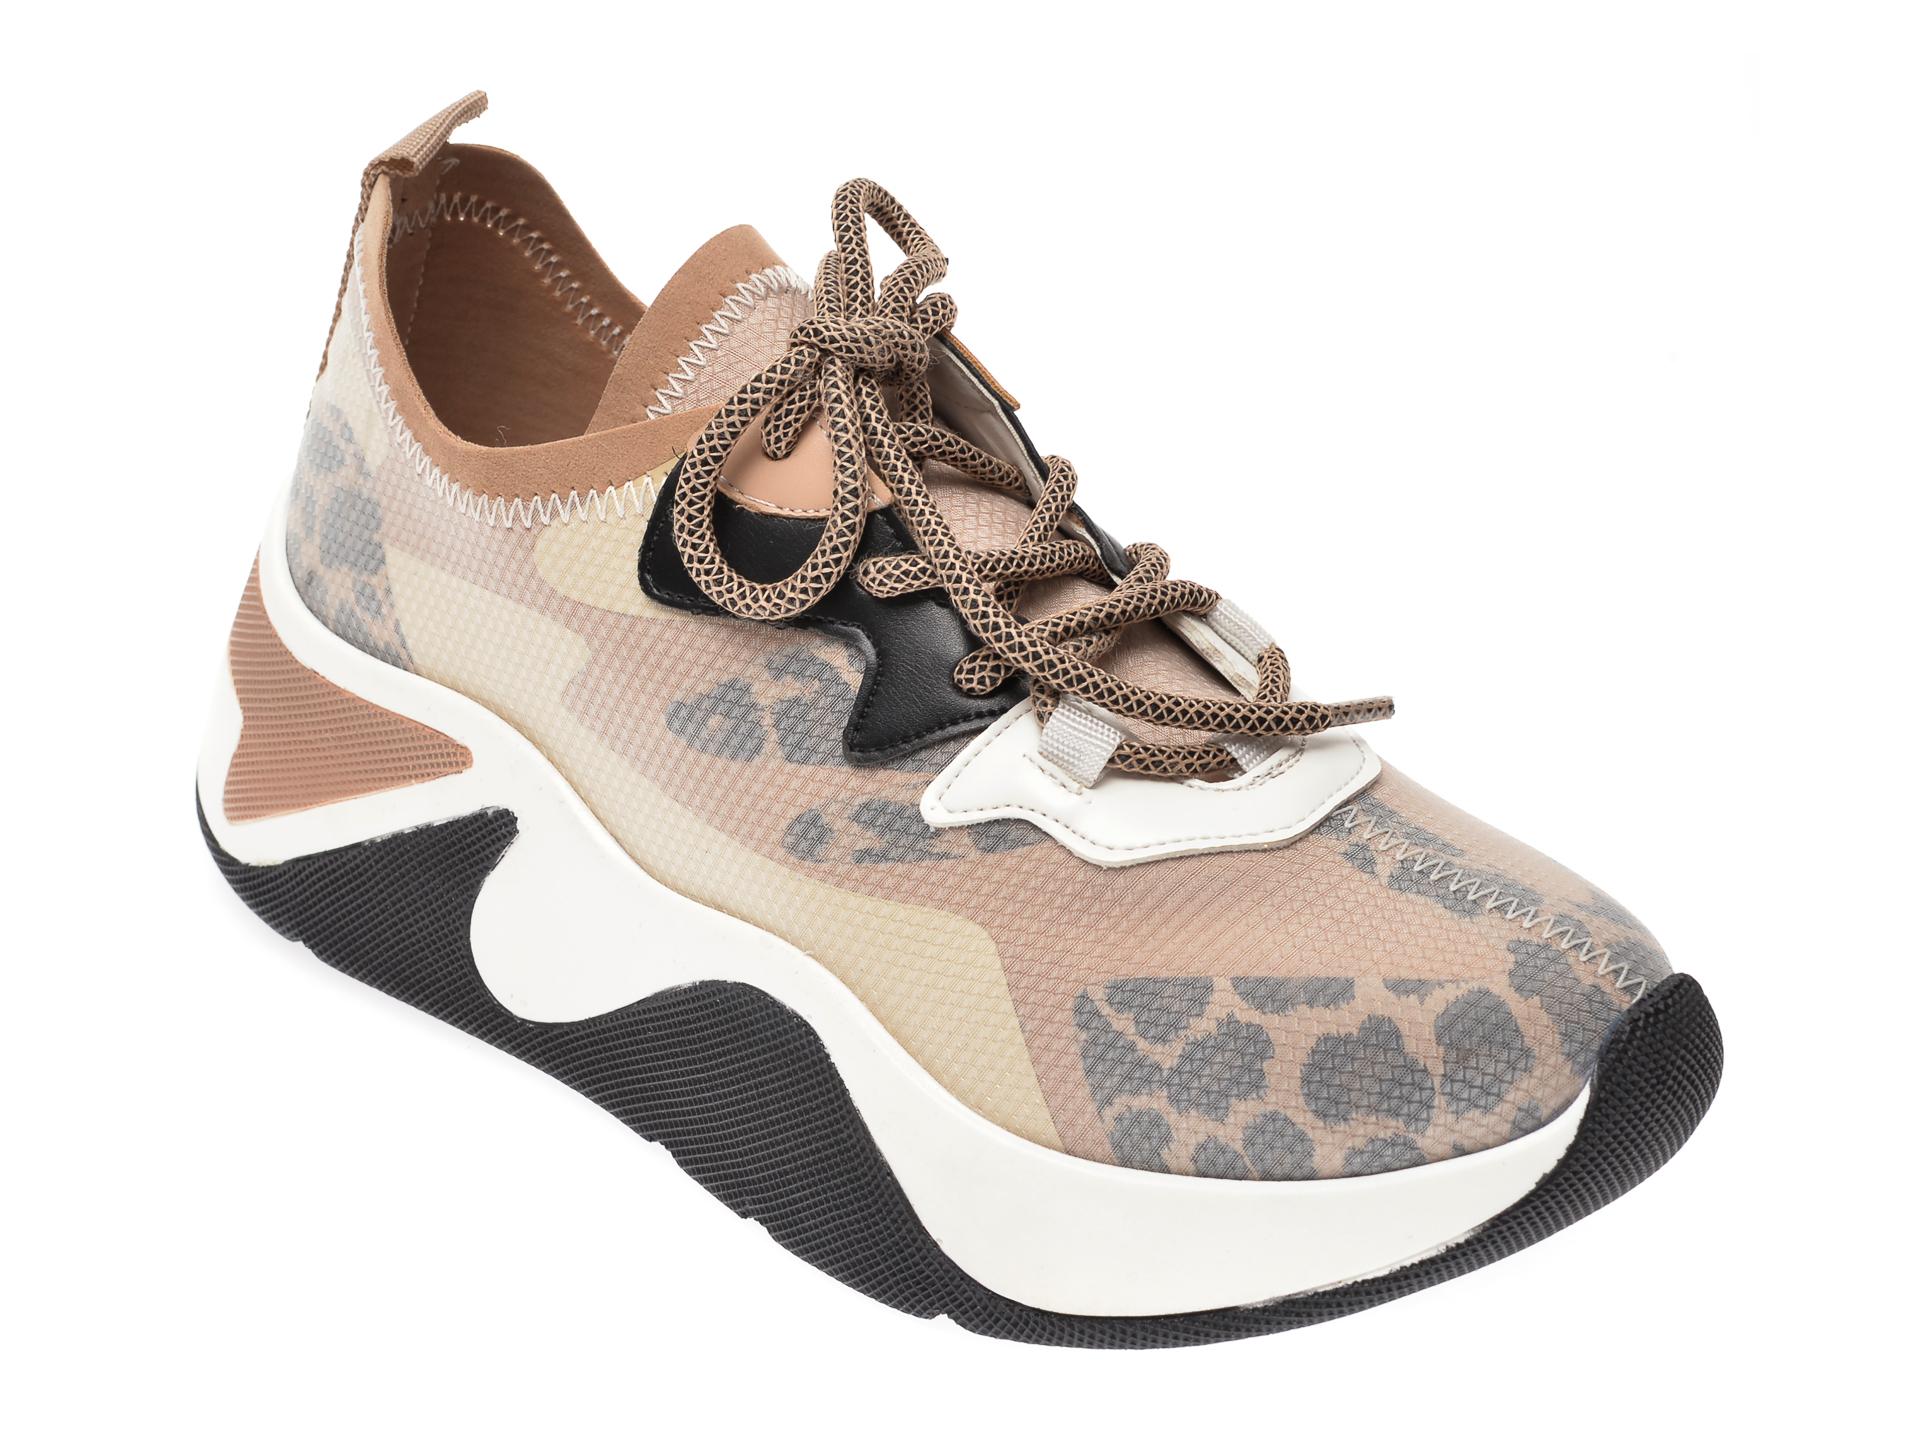 Pantofi sport GRYXX bej, MK18, din material textil New